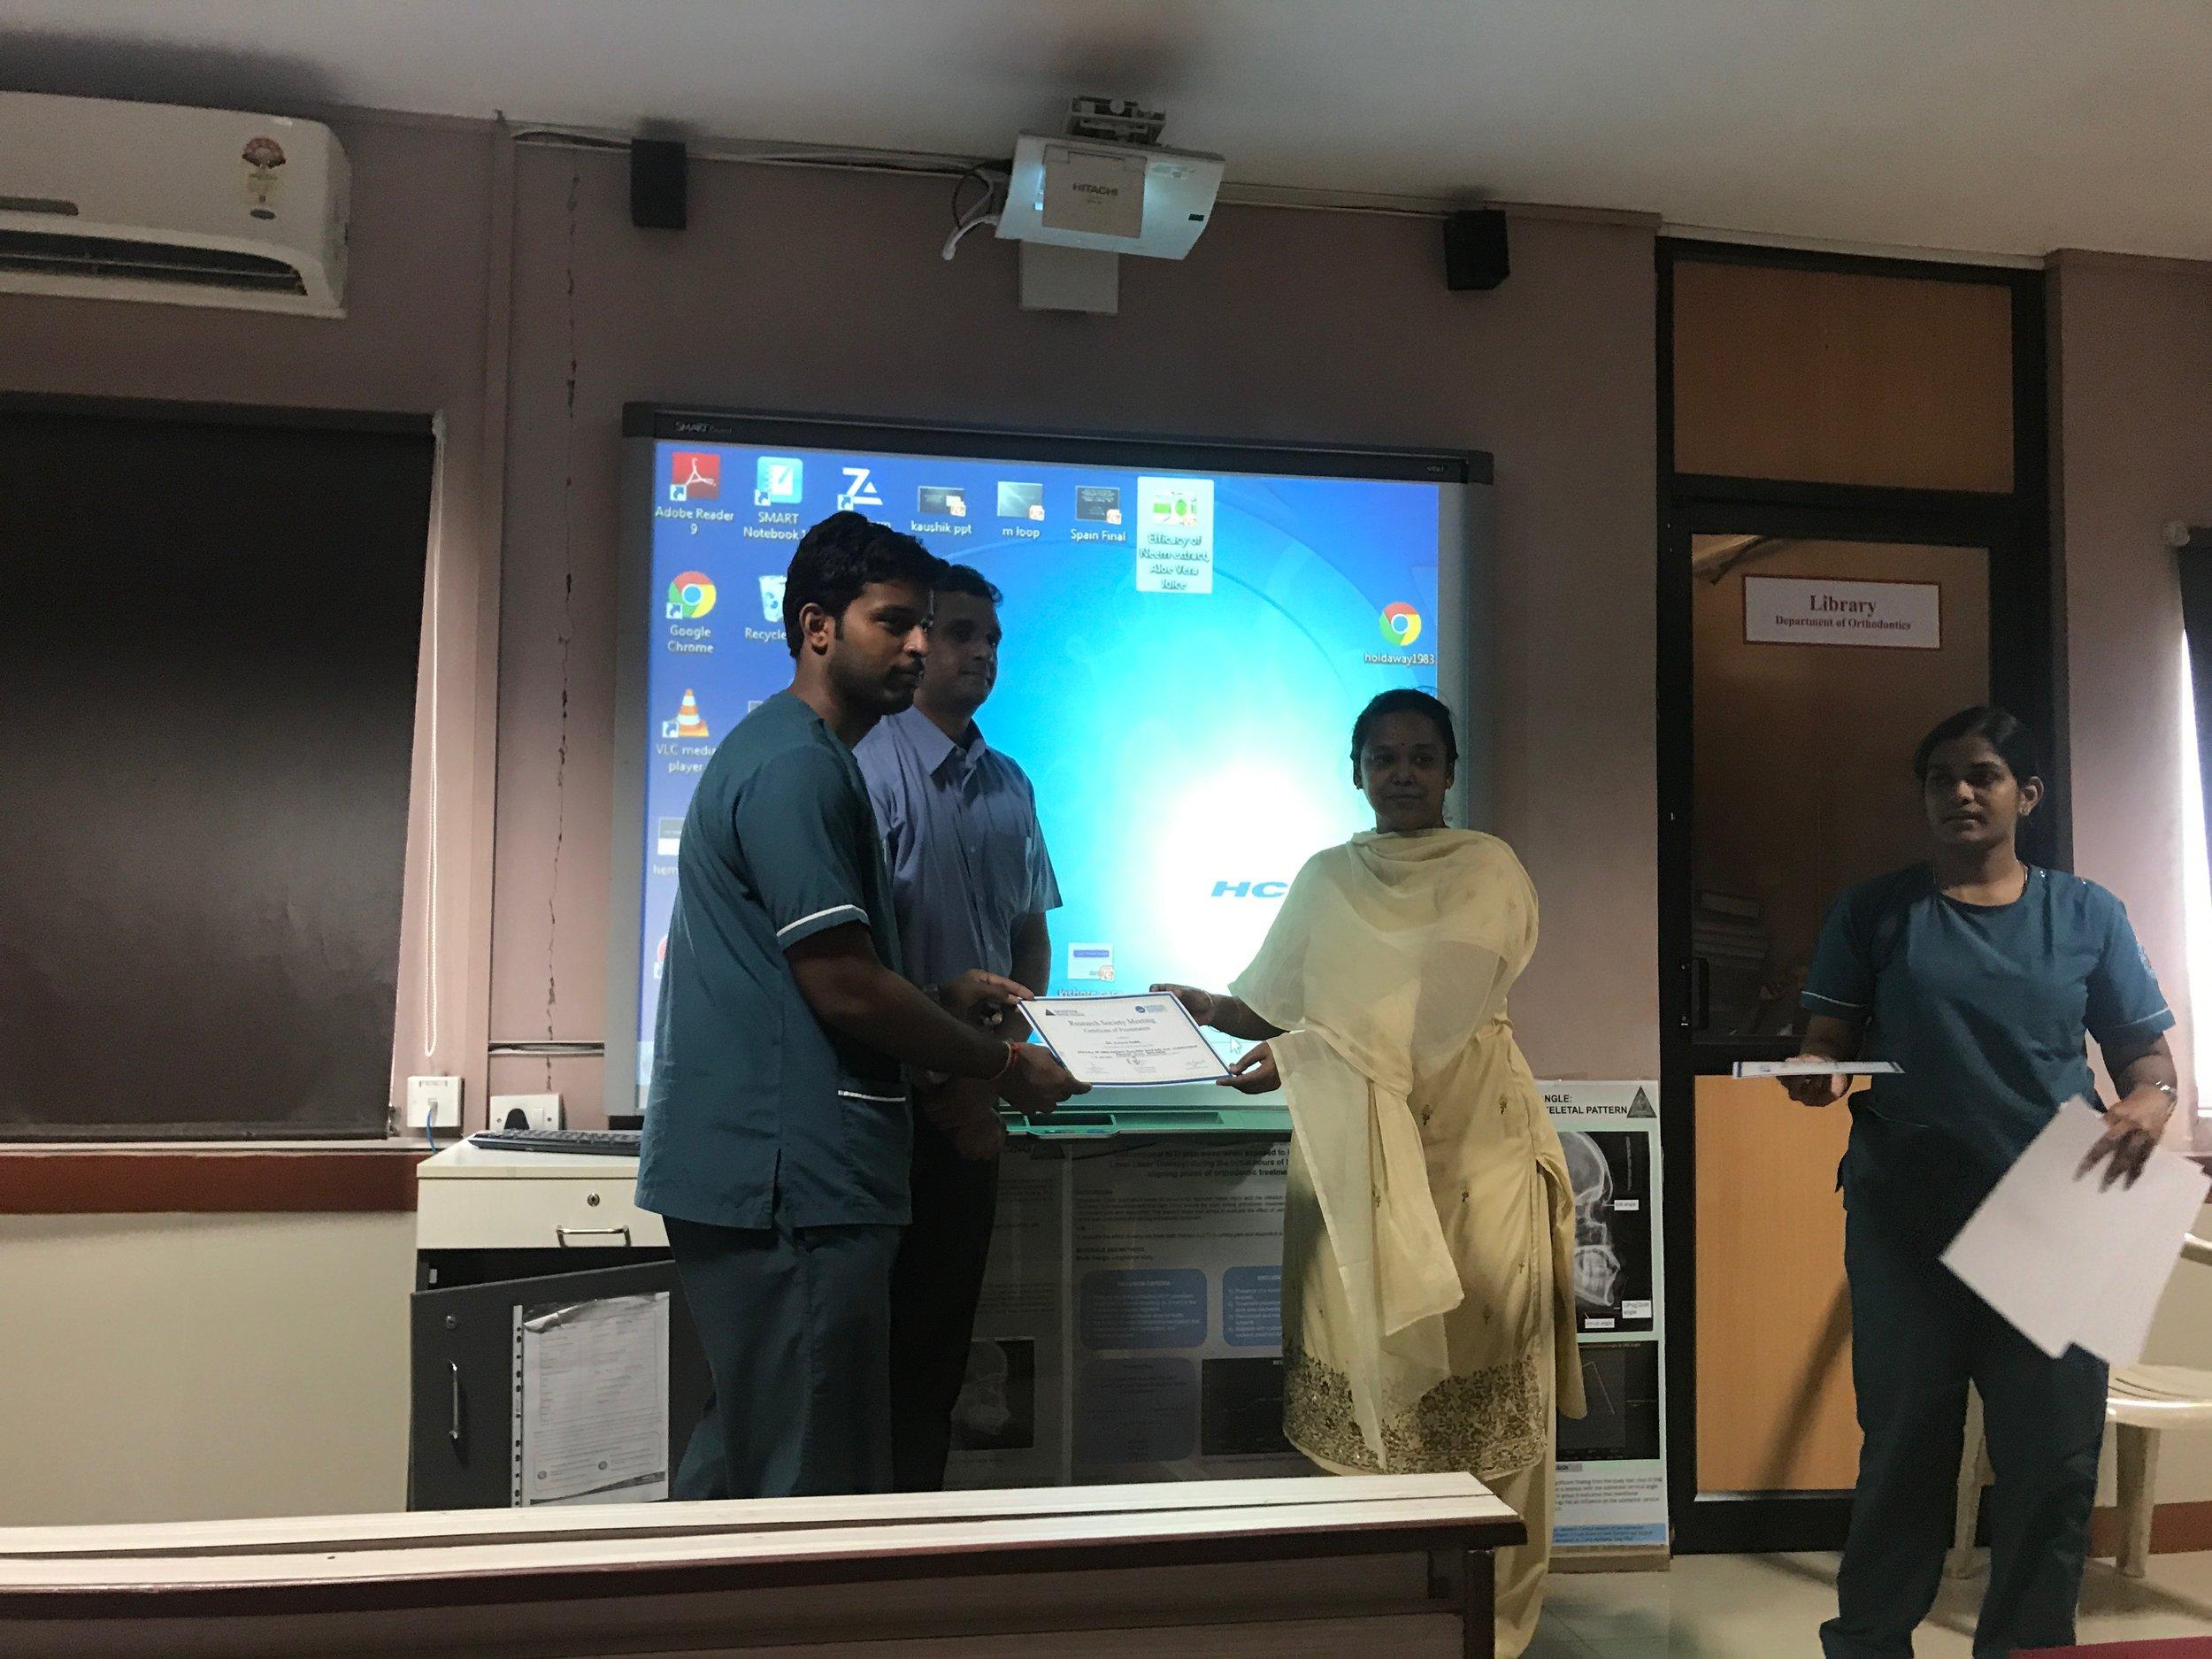 Best Paper - Dr.Shiva shankar - III year post GraduateTitle: Efficacy of Neem extract, Aloevera juice and 0.2% Chlorhexidine against DUWL pathogens